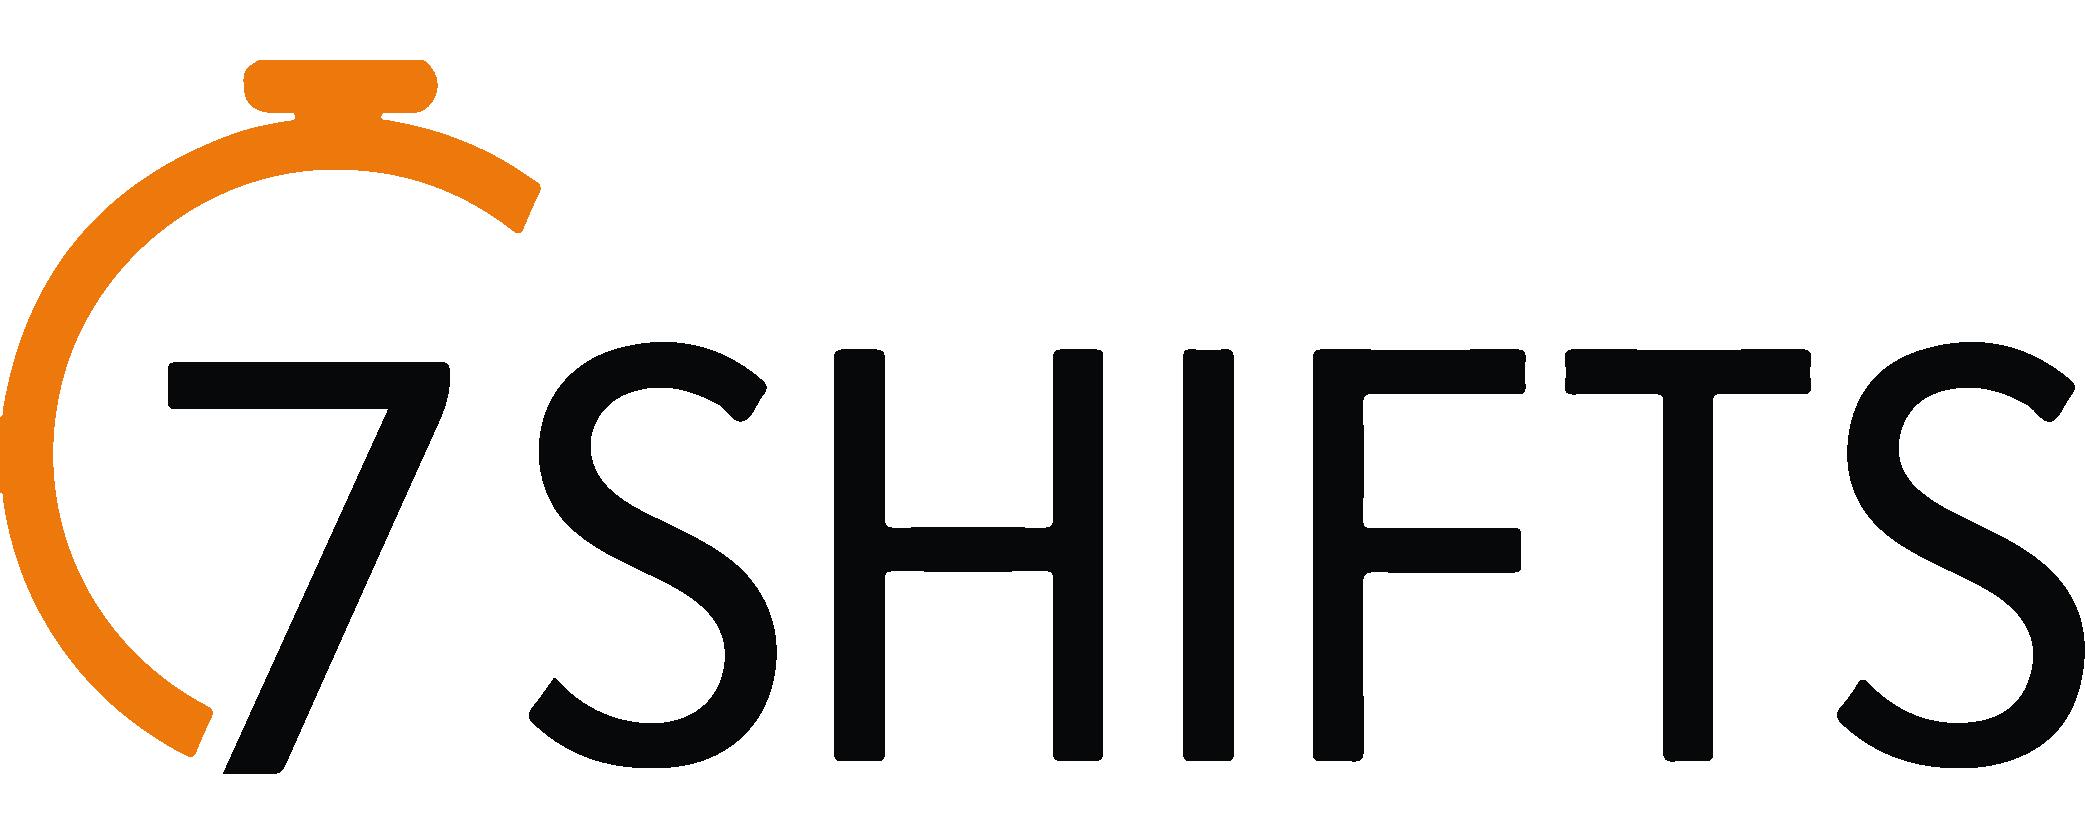 7-shifts-logo